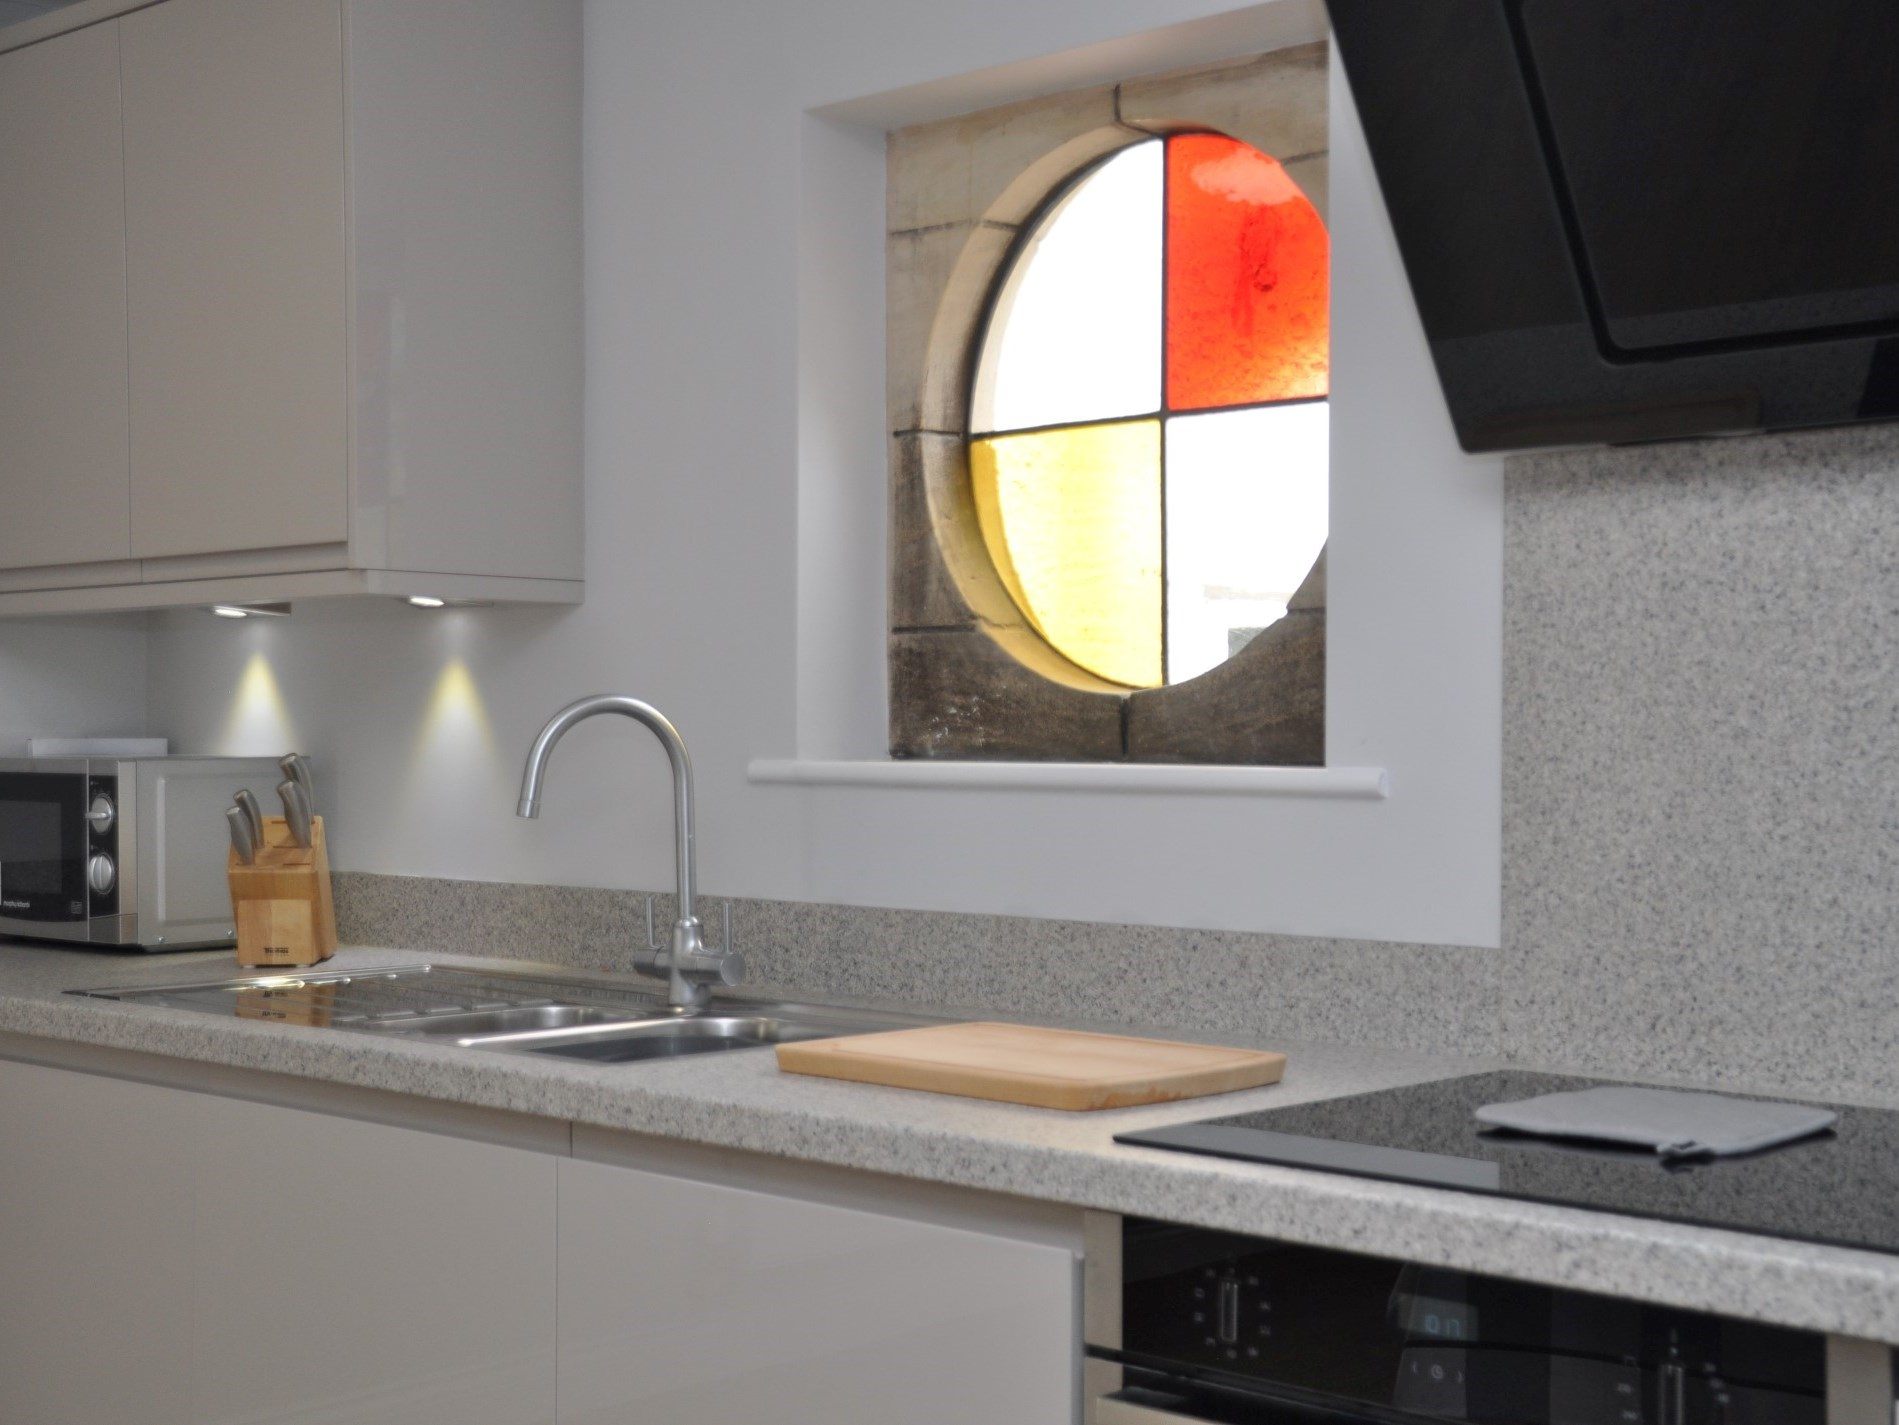 The original round window offers a splash of colour